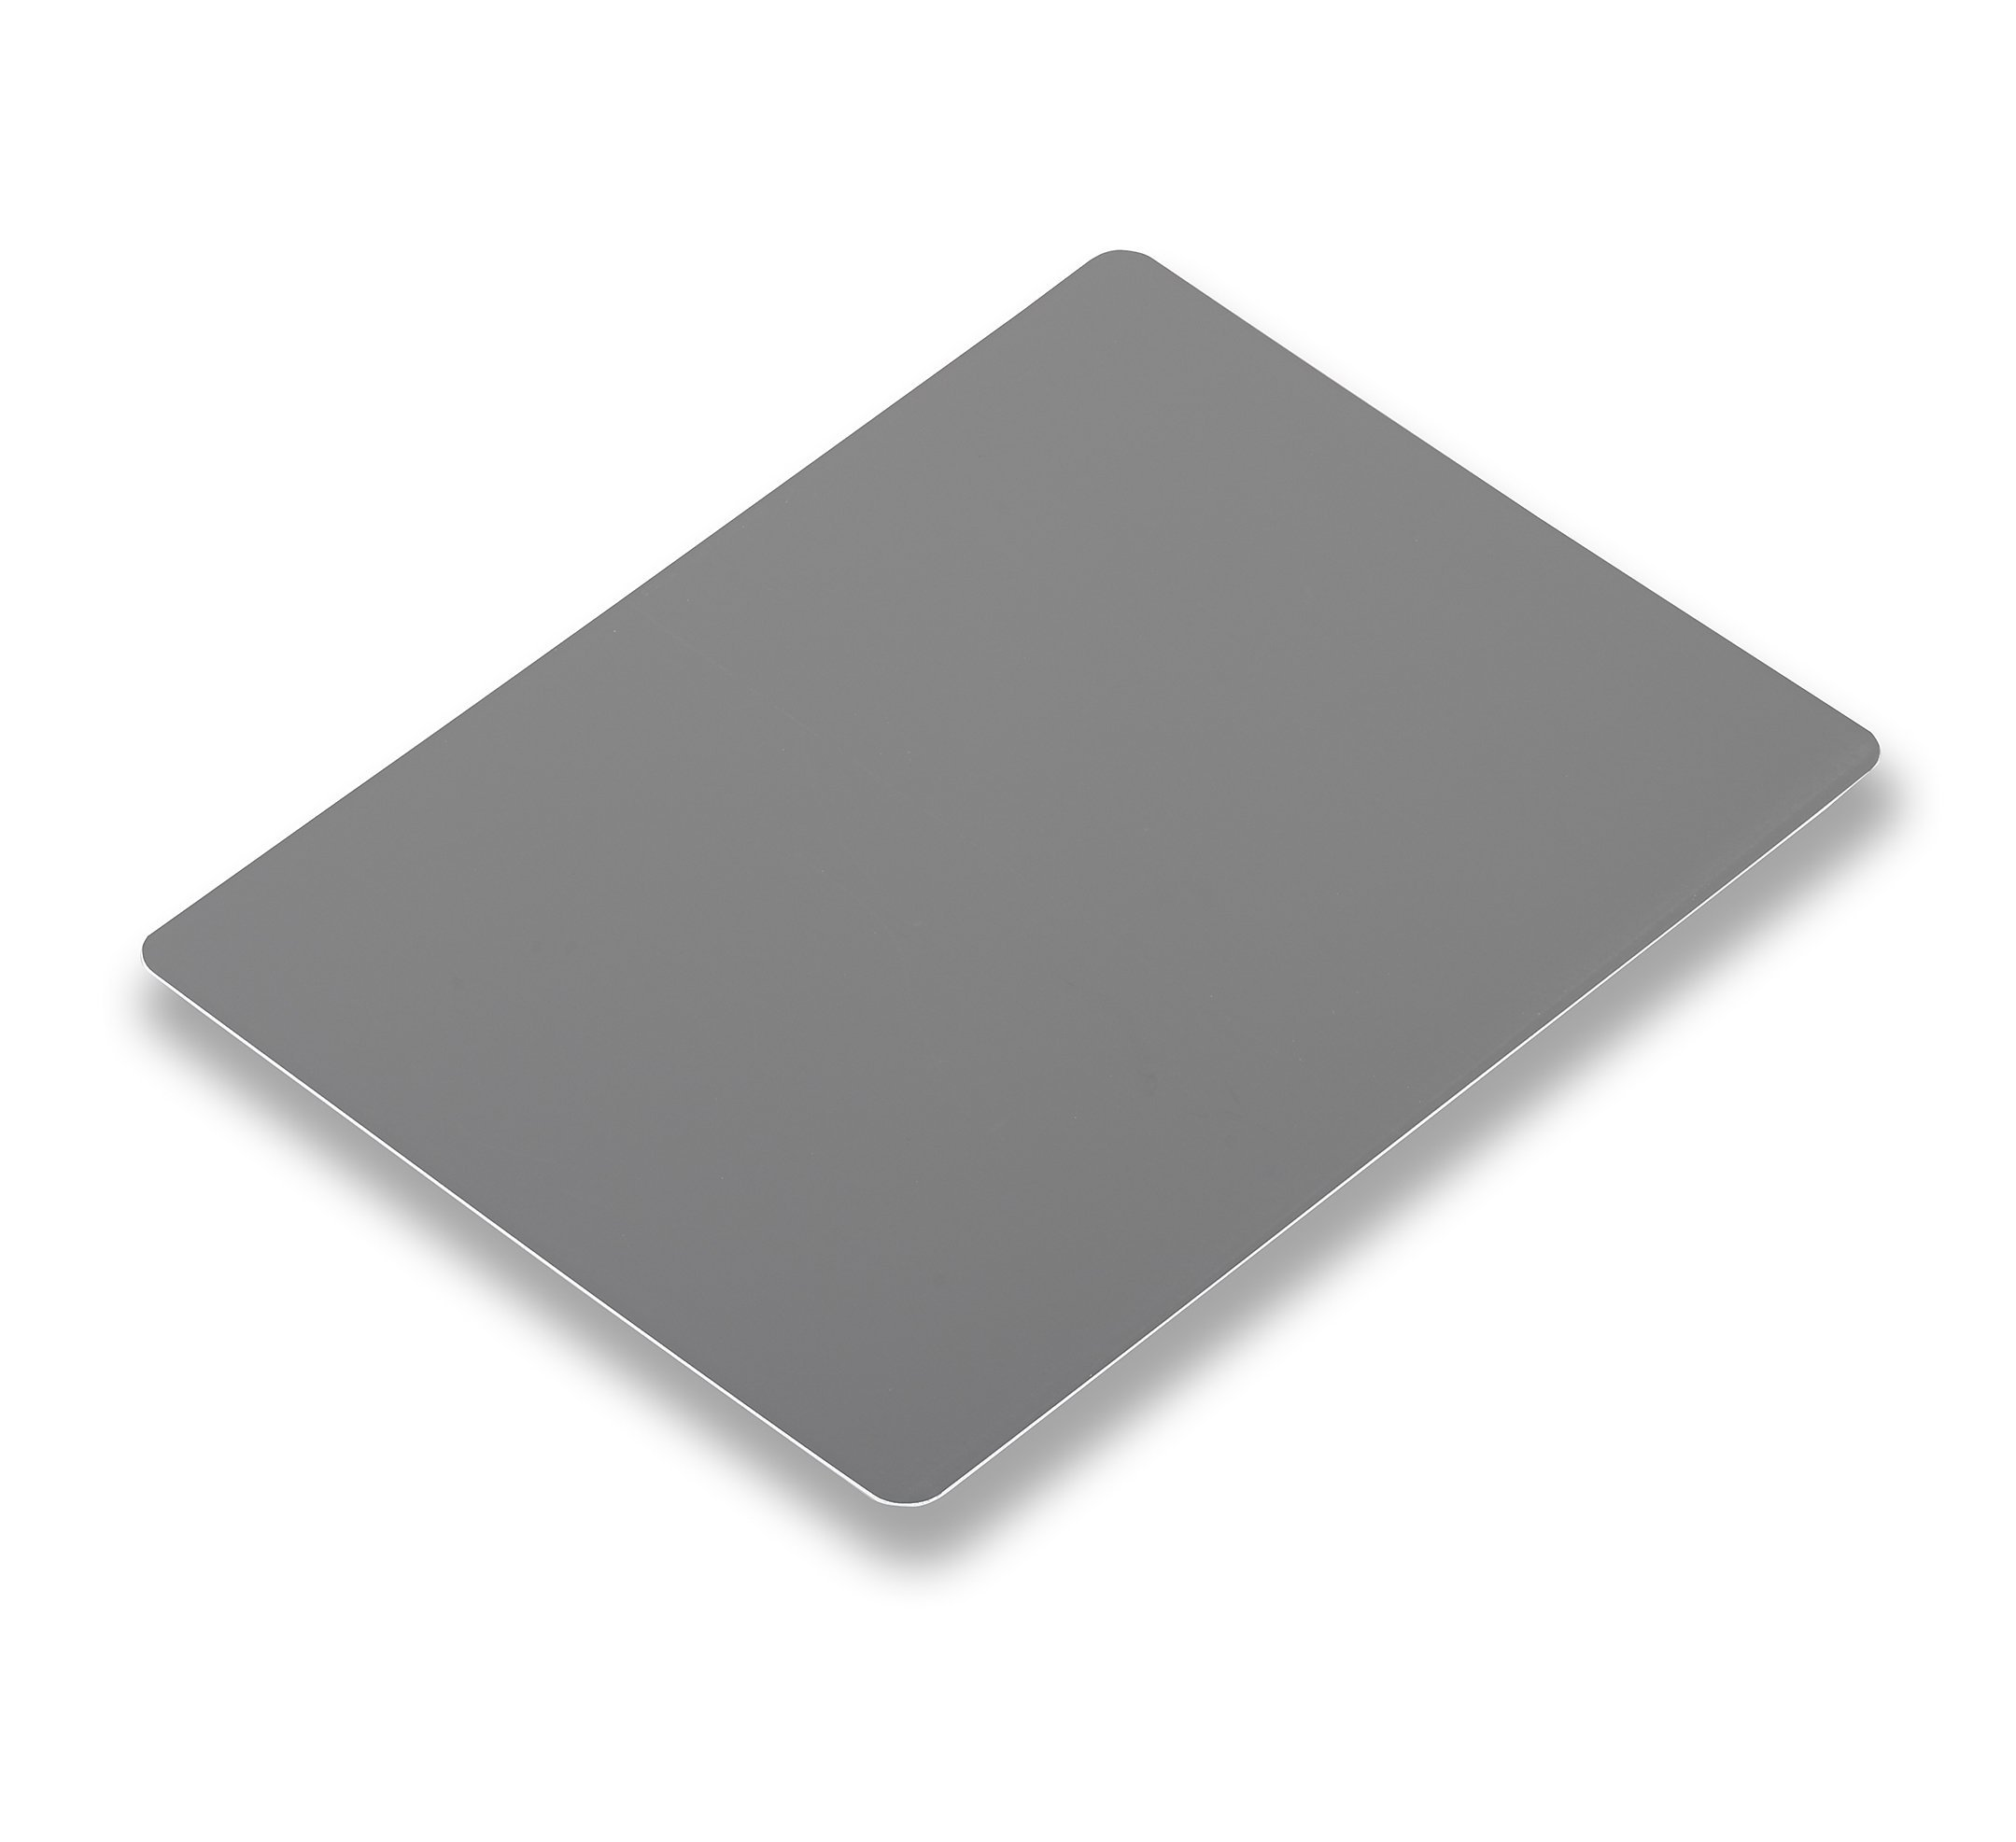 Novoflex 9x8'' Grey/White Card for Manual White Balance/ Exposure (ZEBRA) by Novoflex